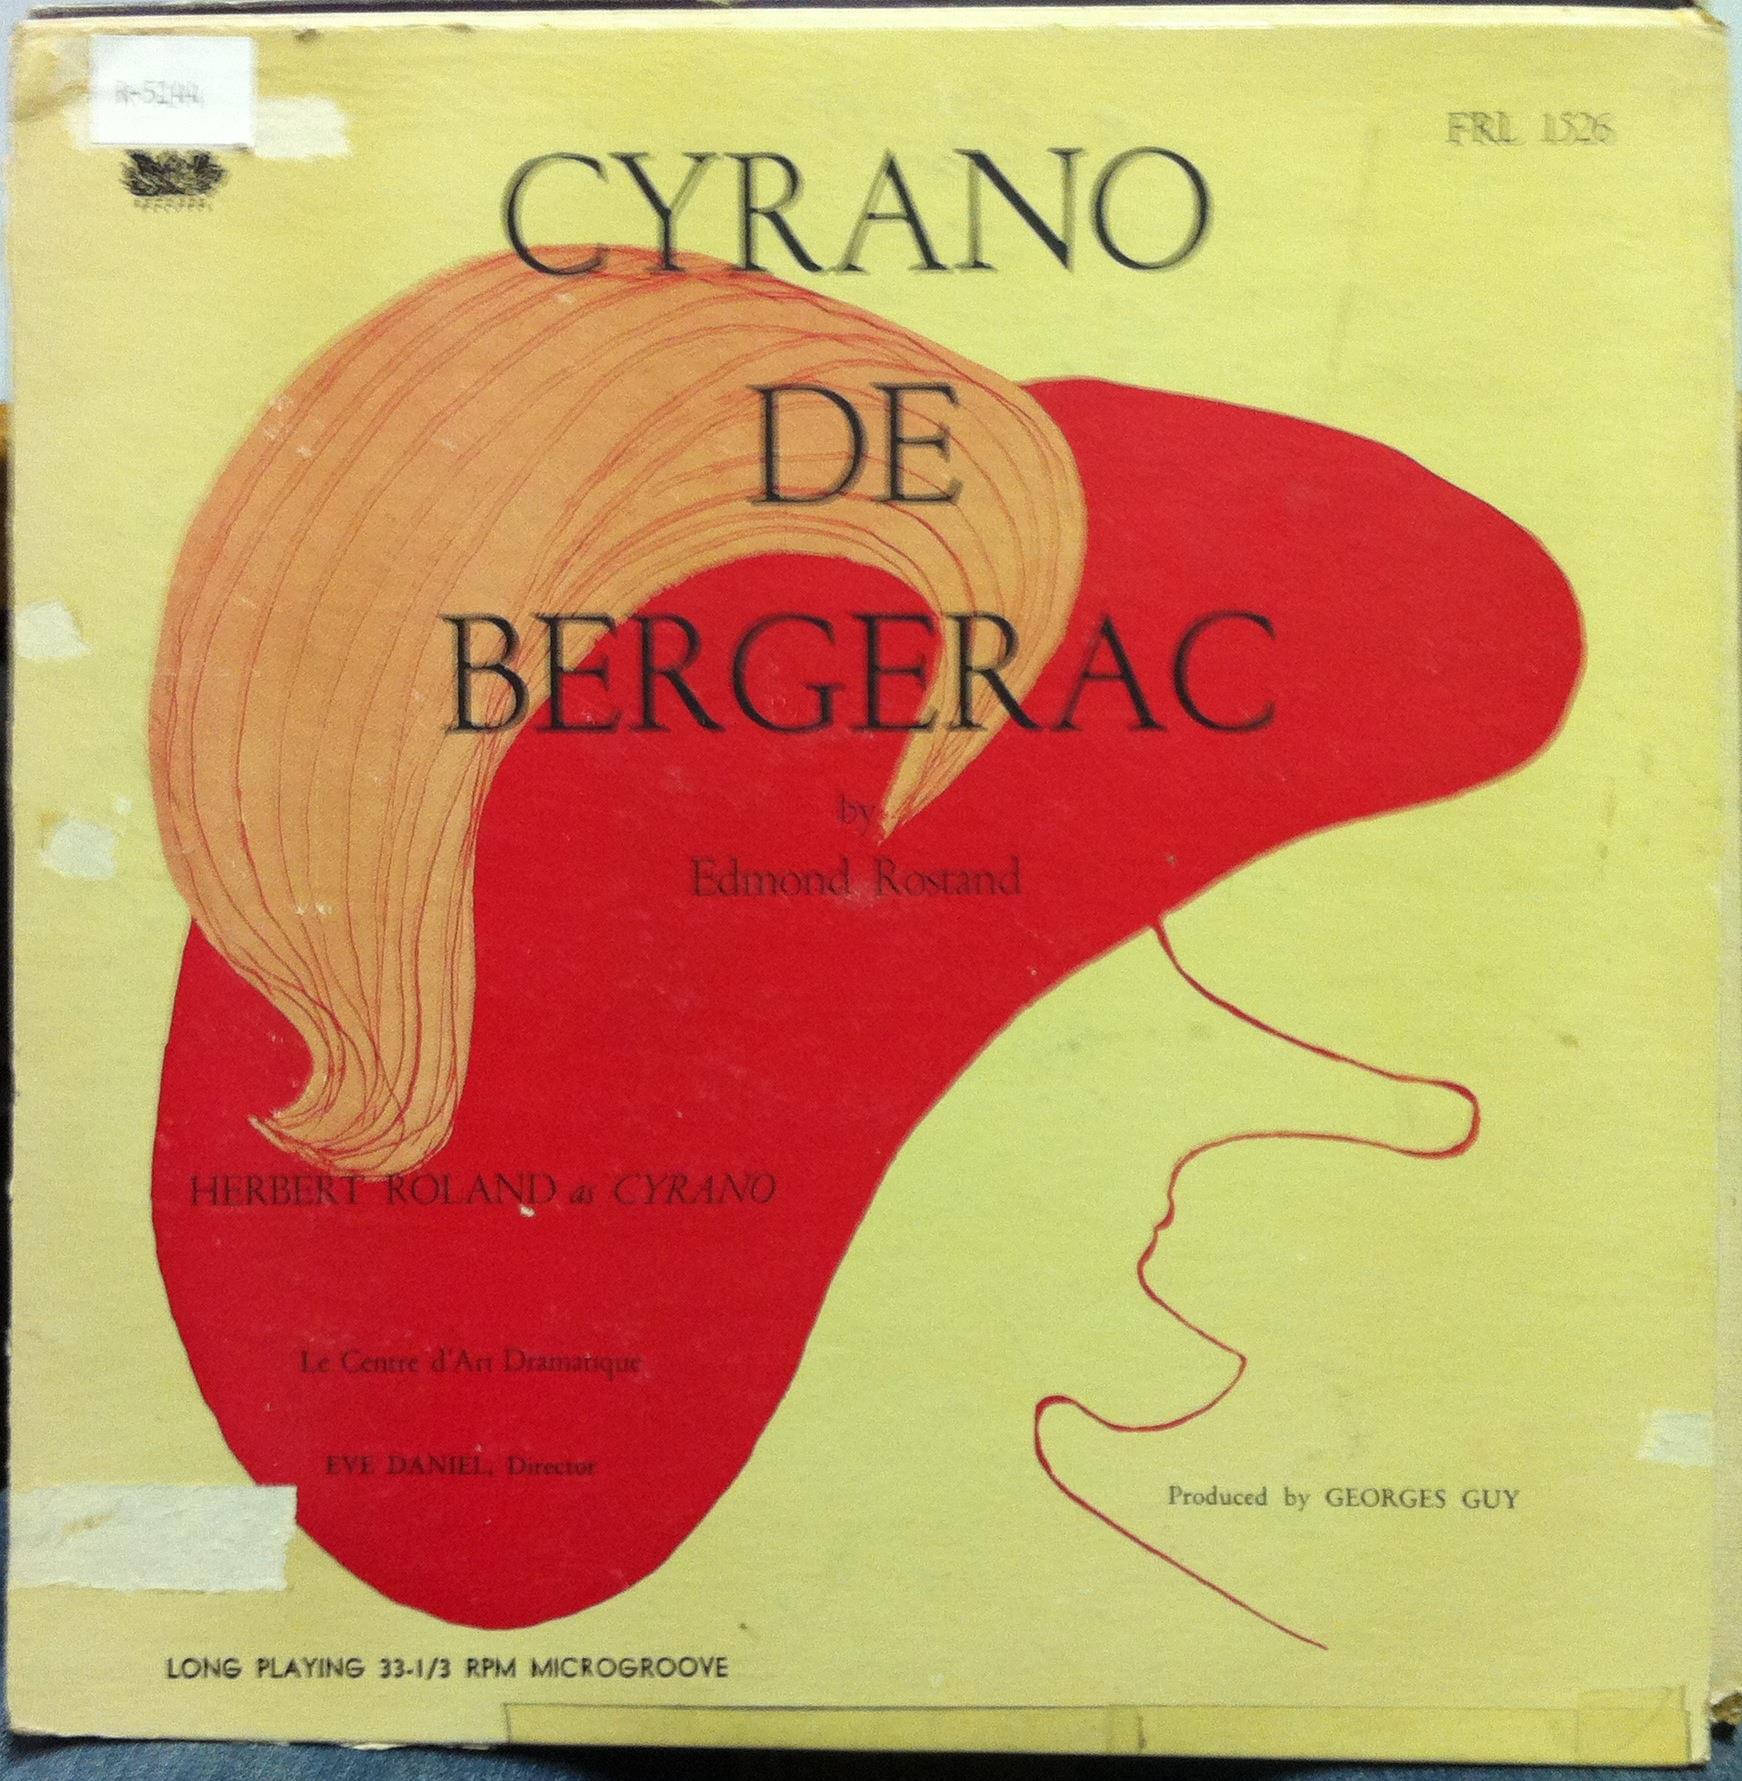 a report on edmond rostands cyrano de bergerac